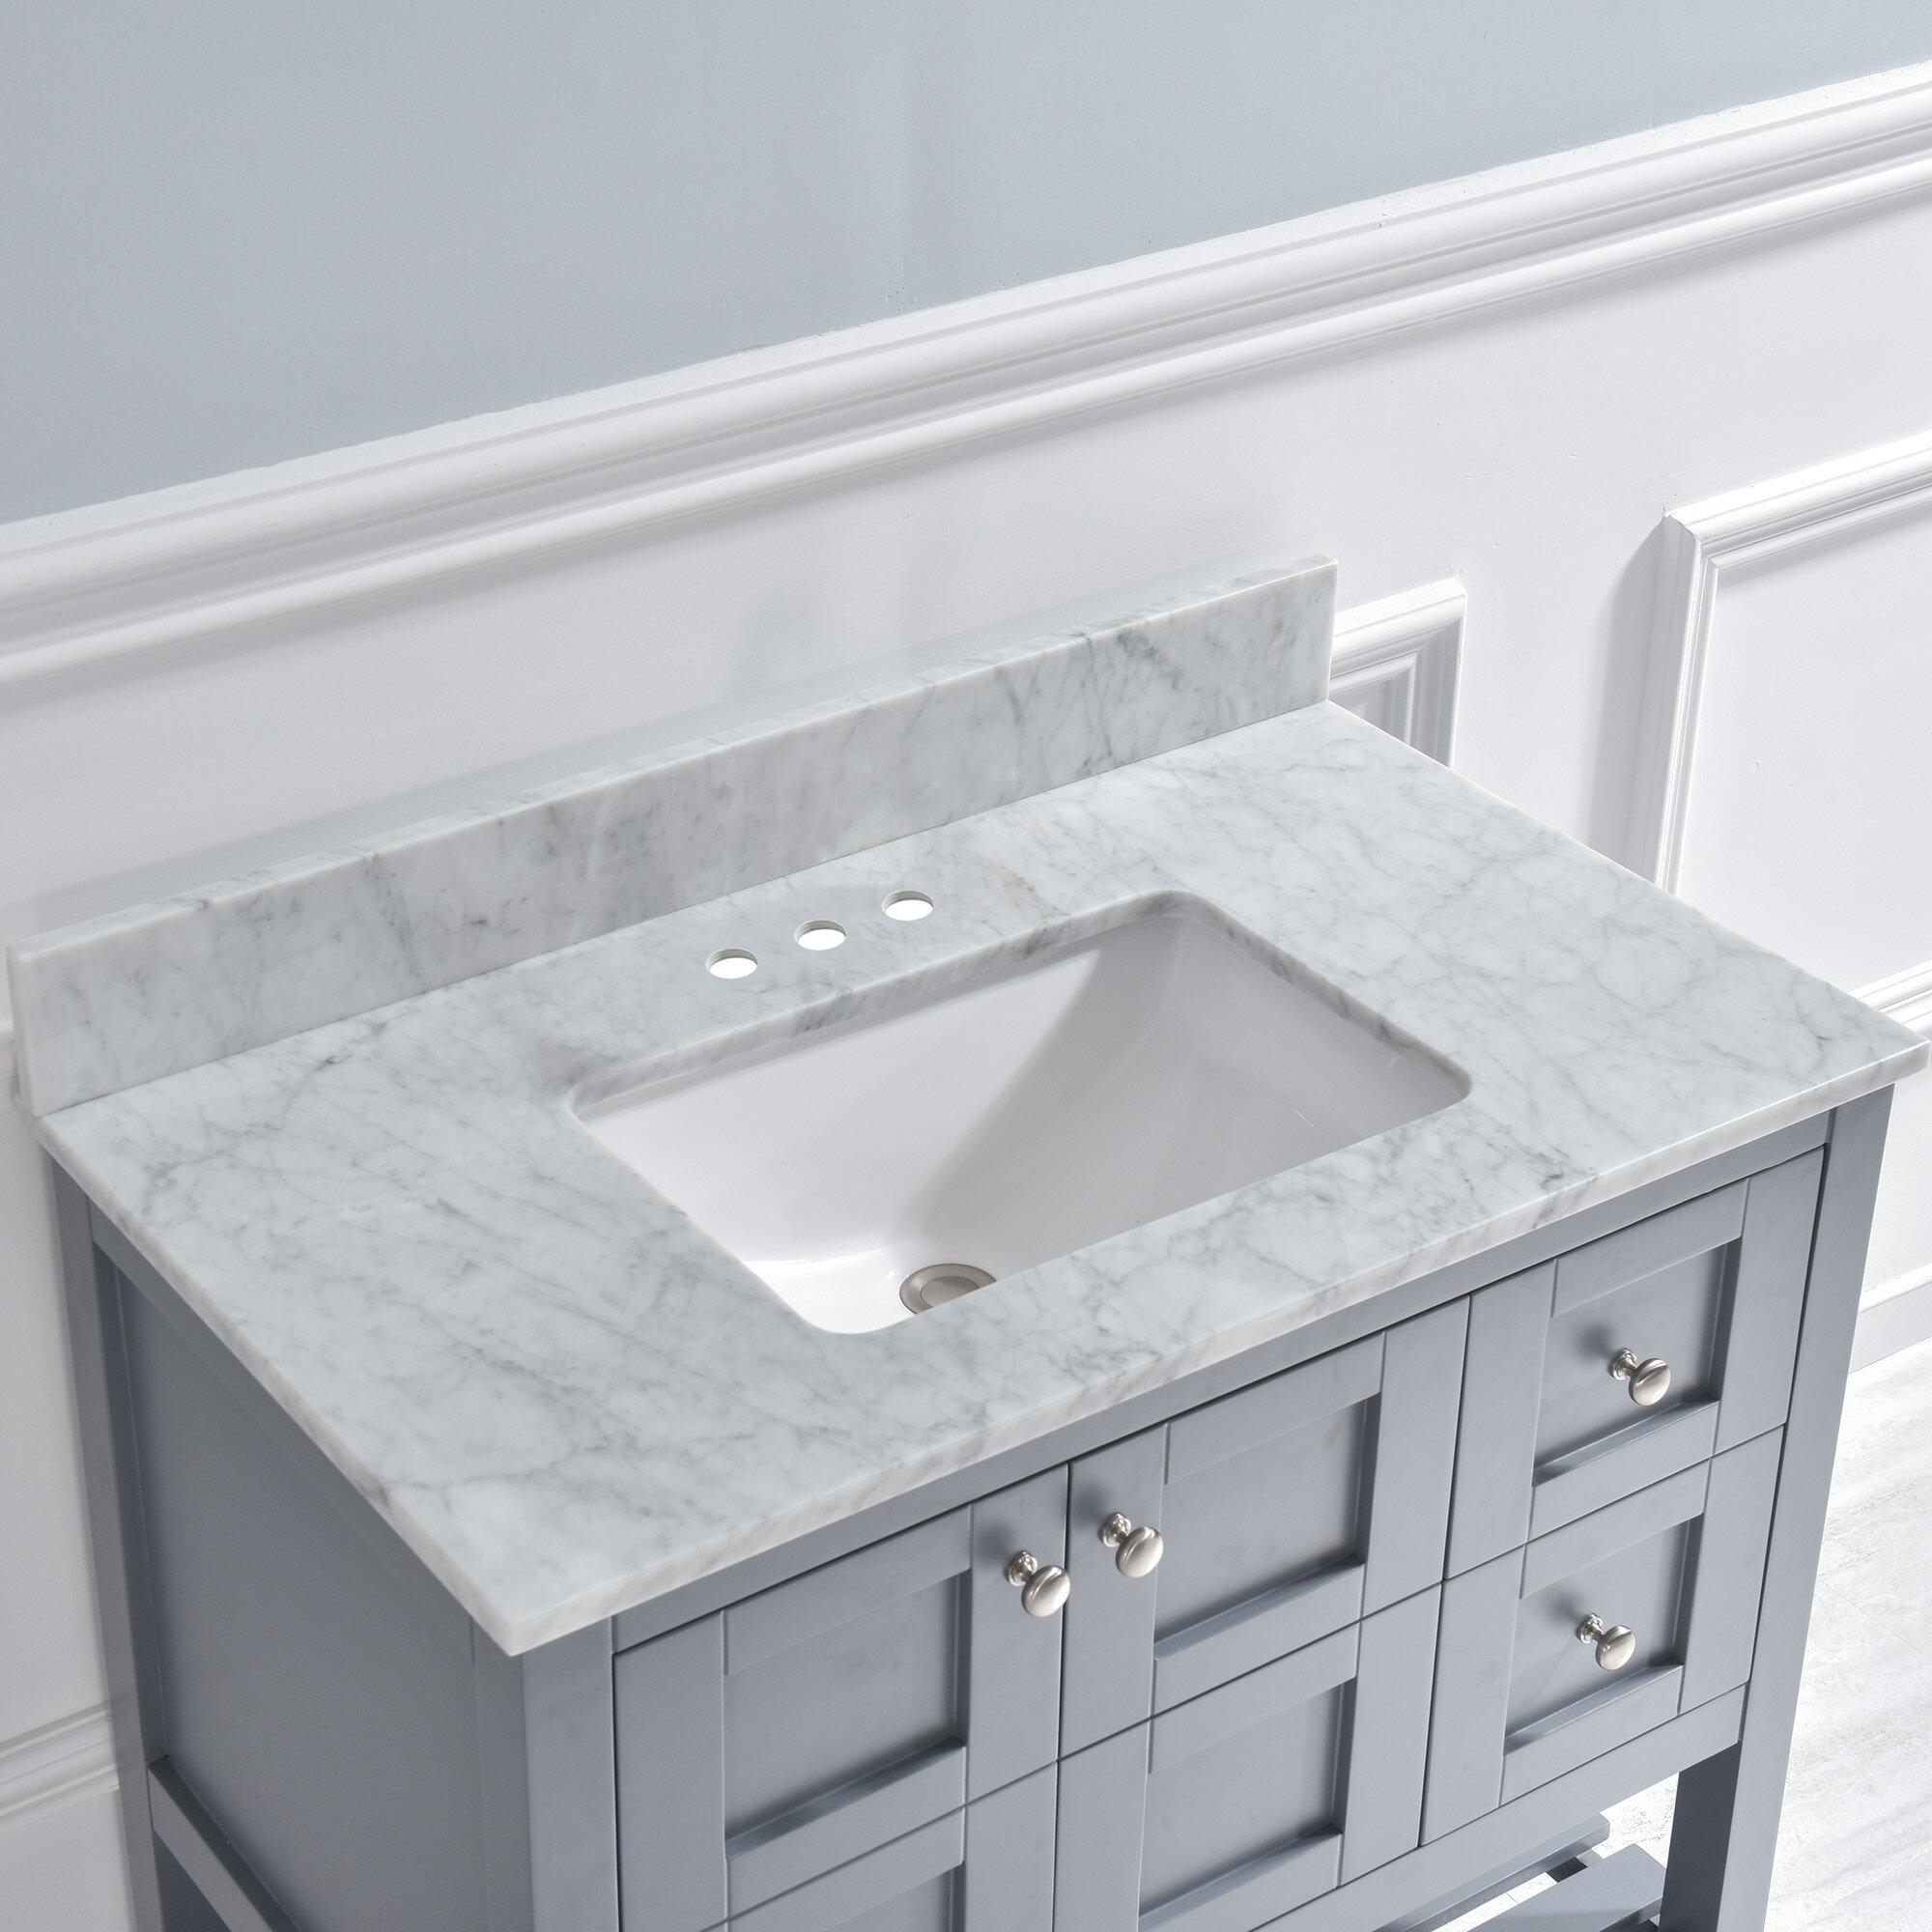 Brilliant 37 Single Bathroom Vanity Top Beutiful Home Inspiration Semekurdistantinfo